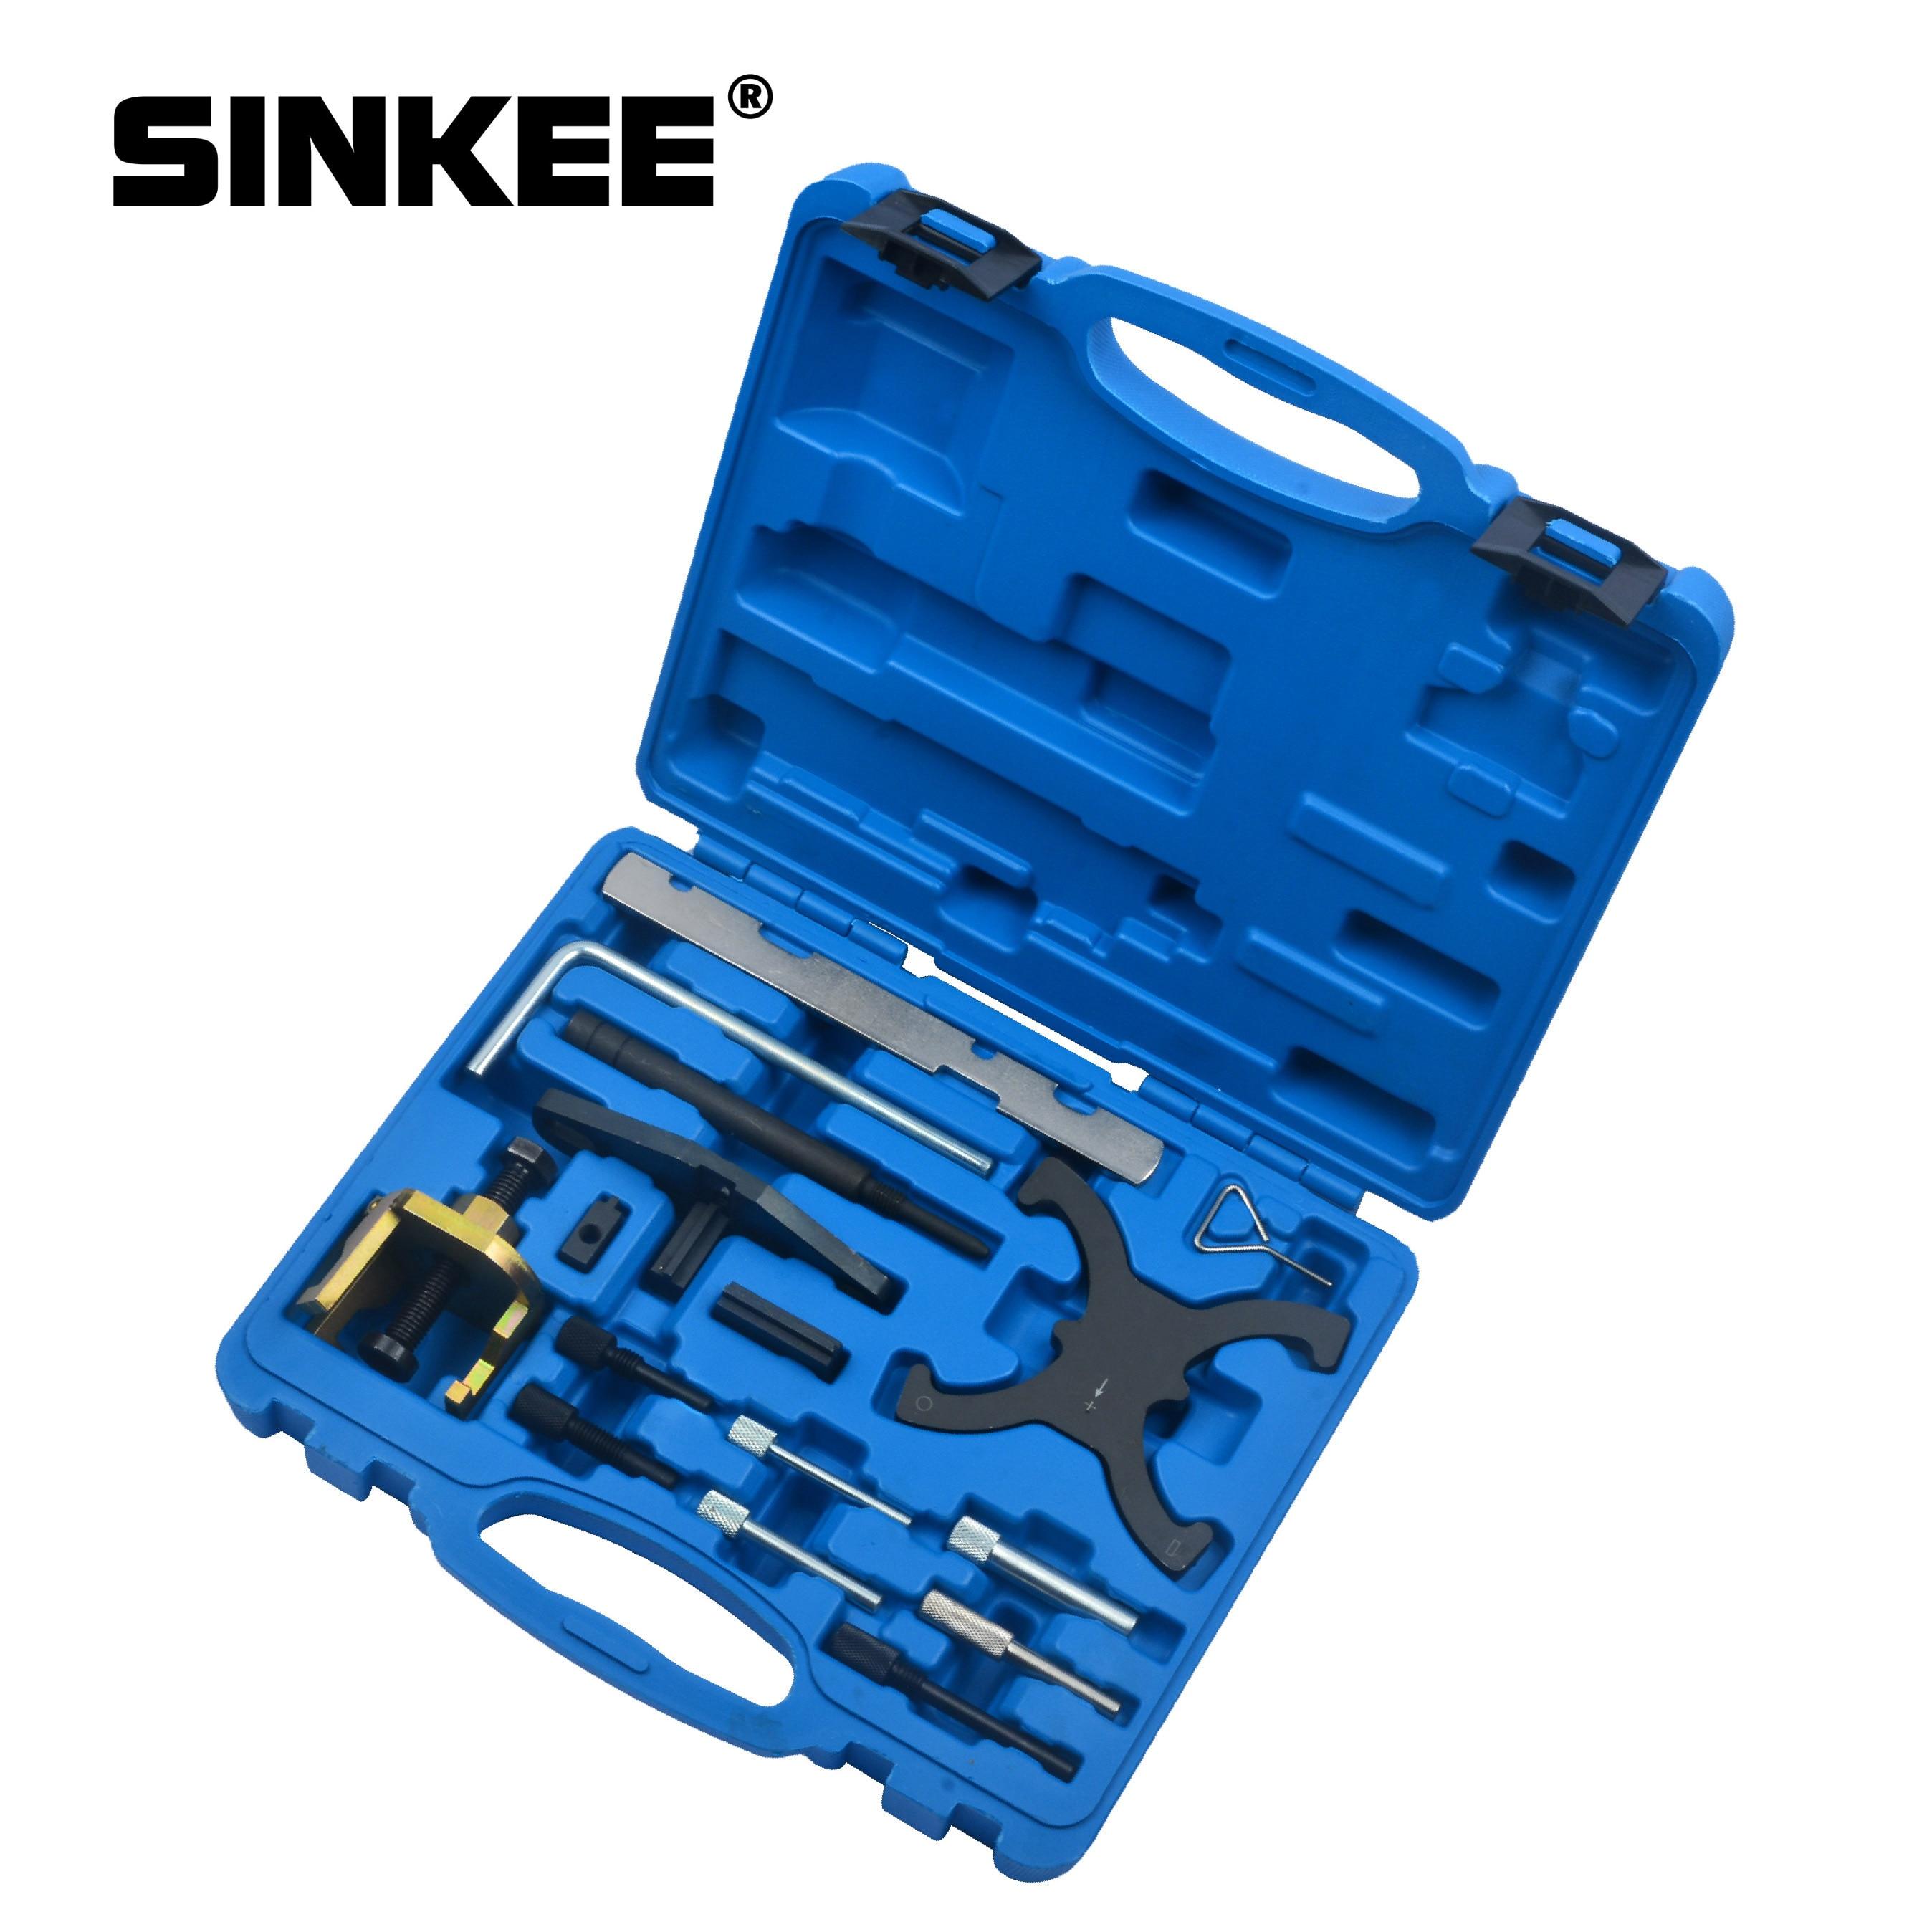 engine-timing-tool-kit-camshaft-flywheel-locking-tools-for-ford-mazda